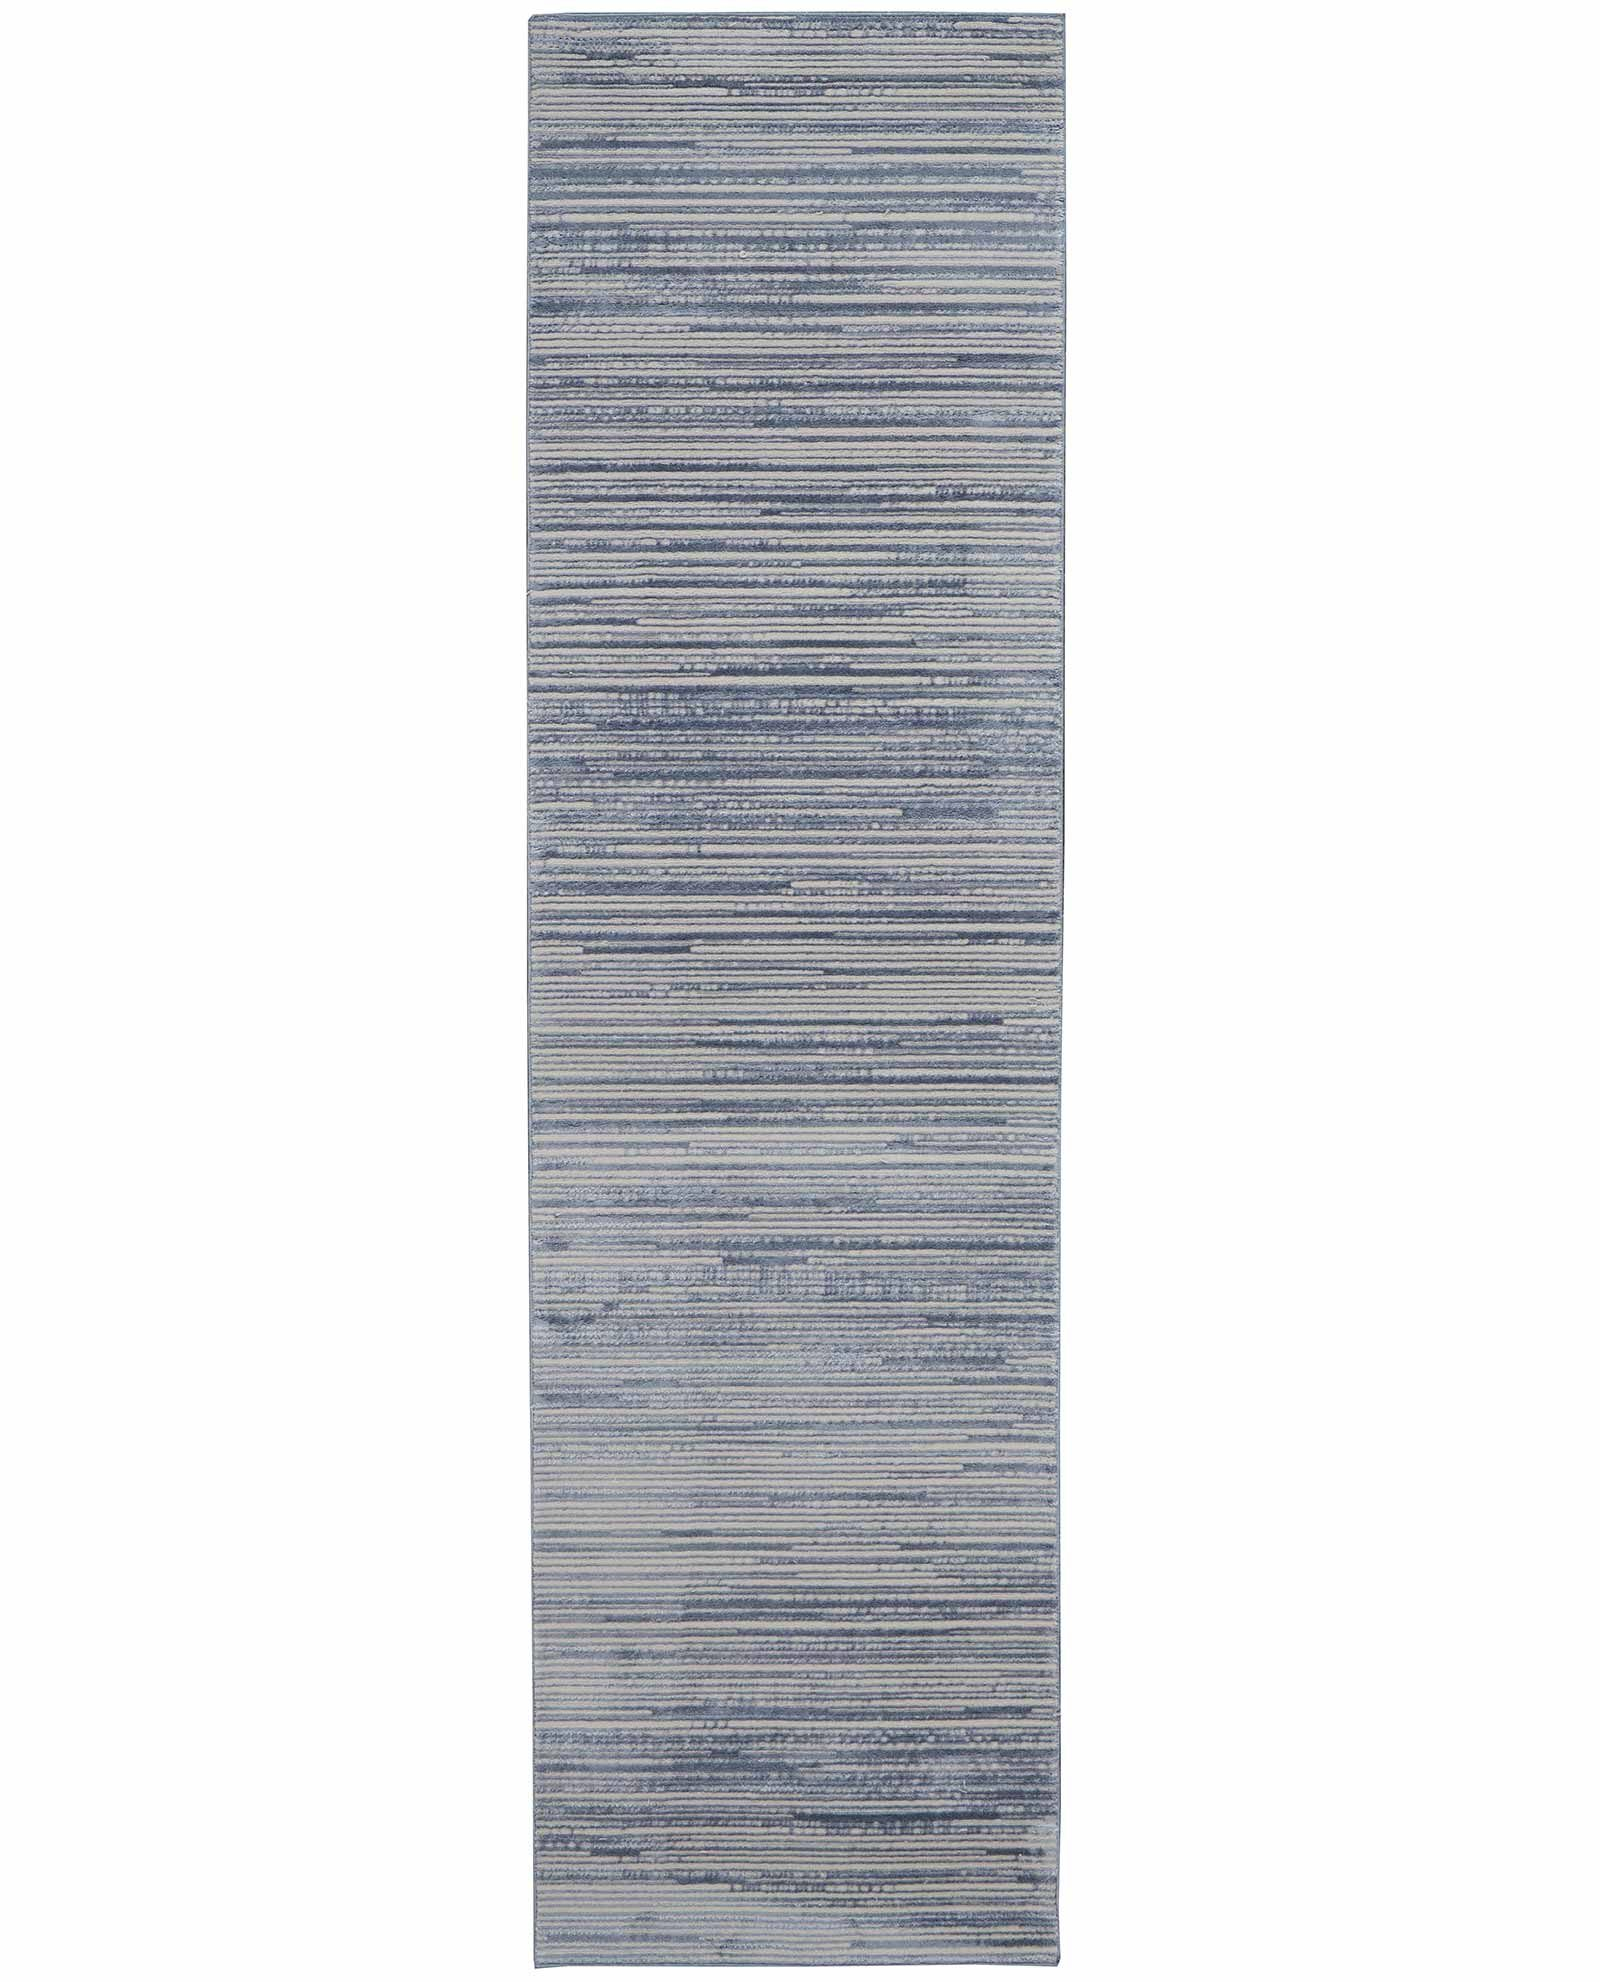 Calvin Klein rug Orlando CK850 CK851 BLUE 2x8 099446487742 flat